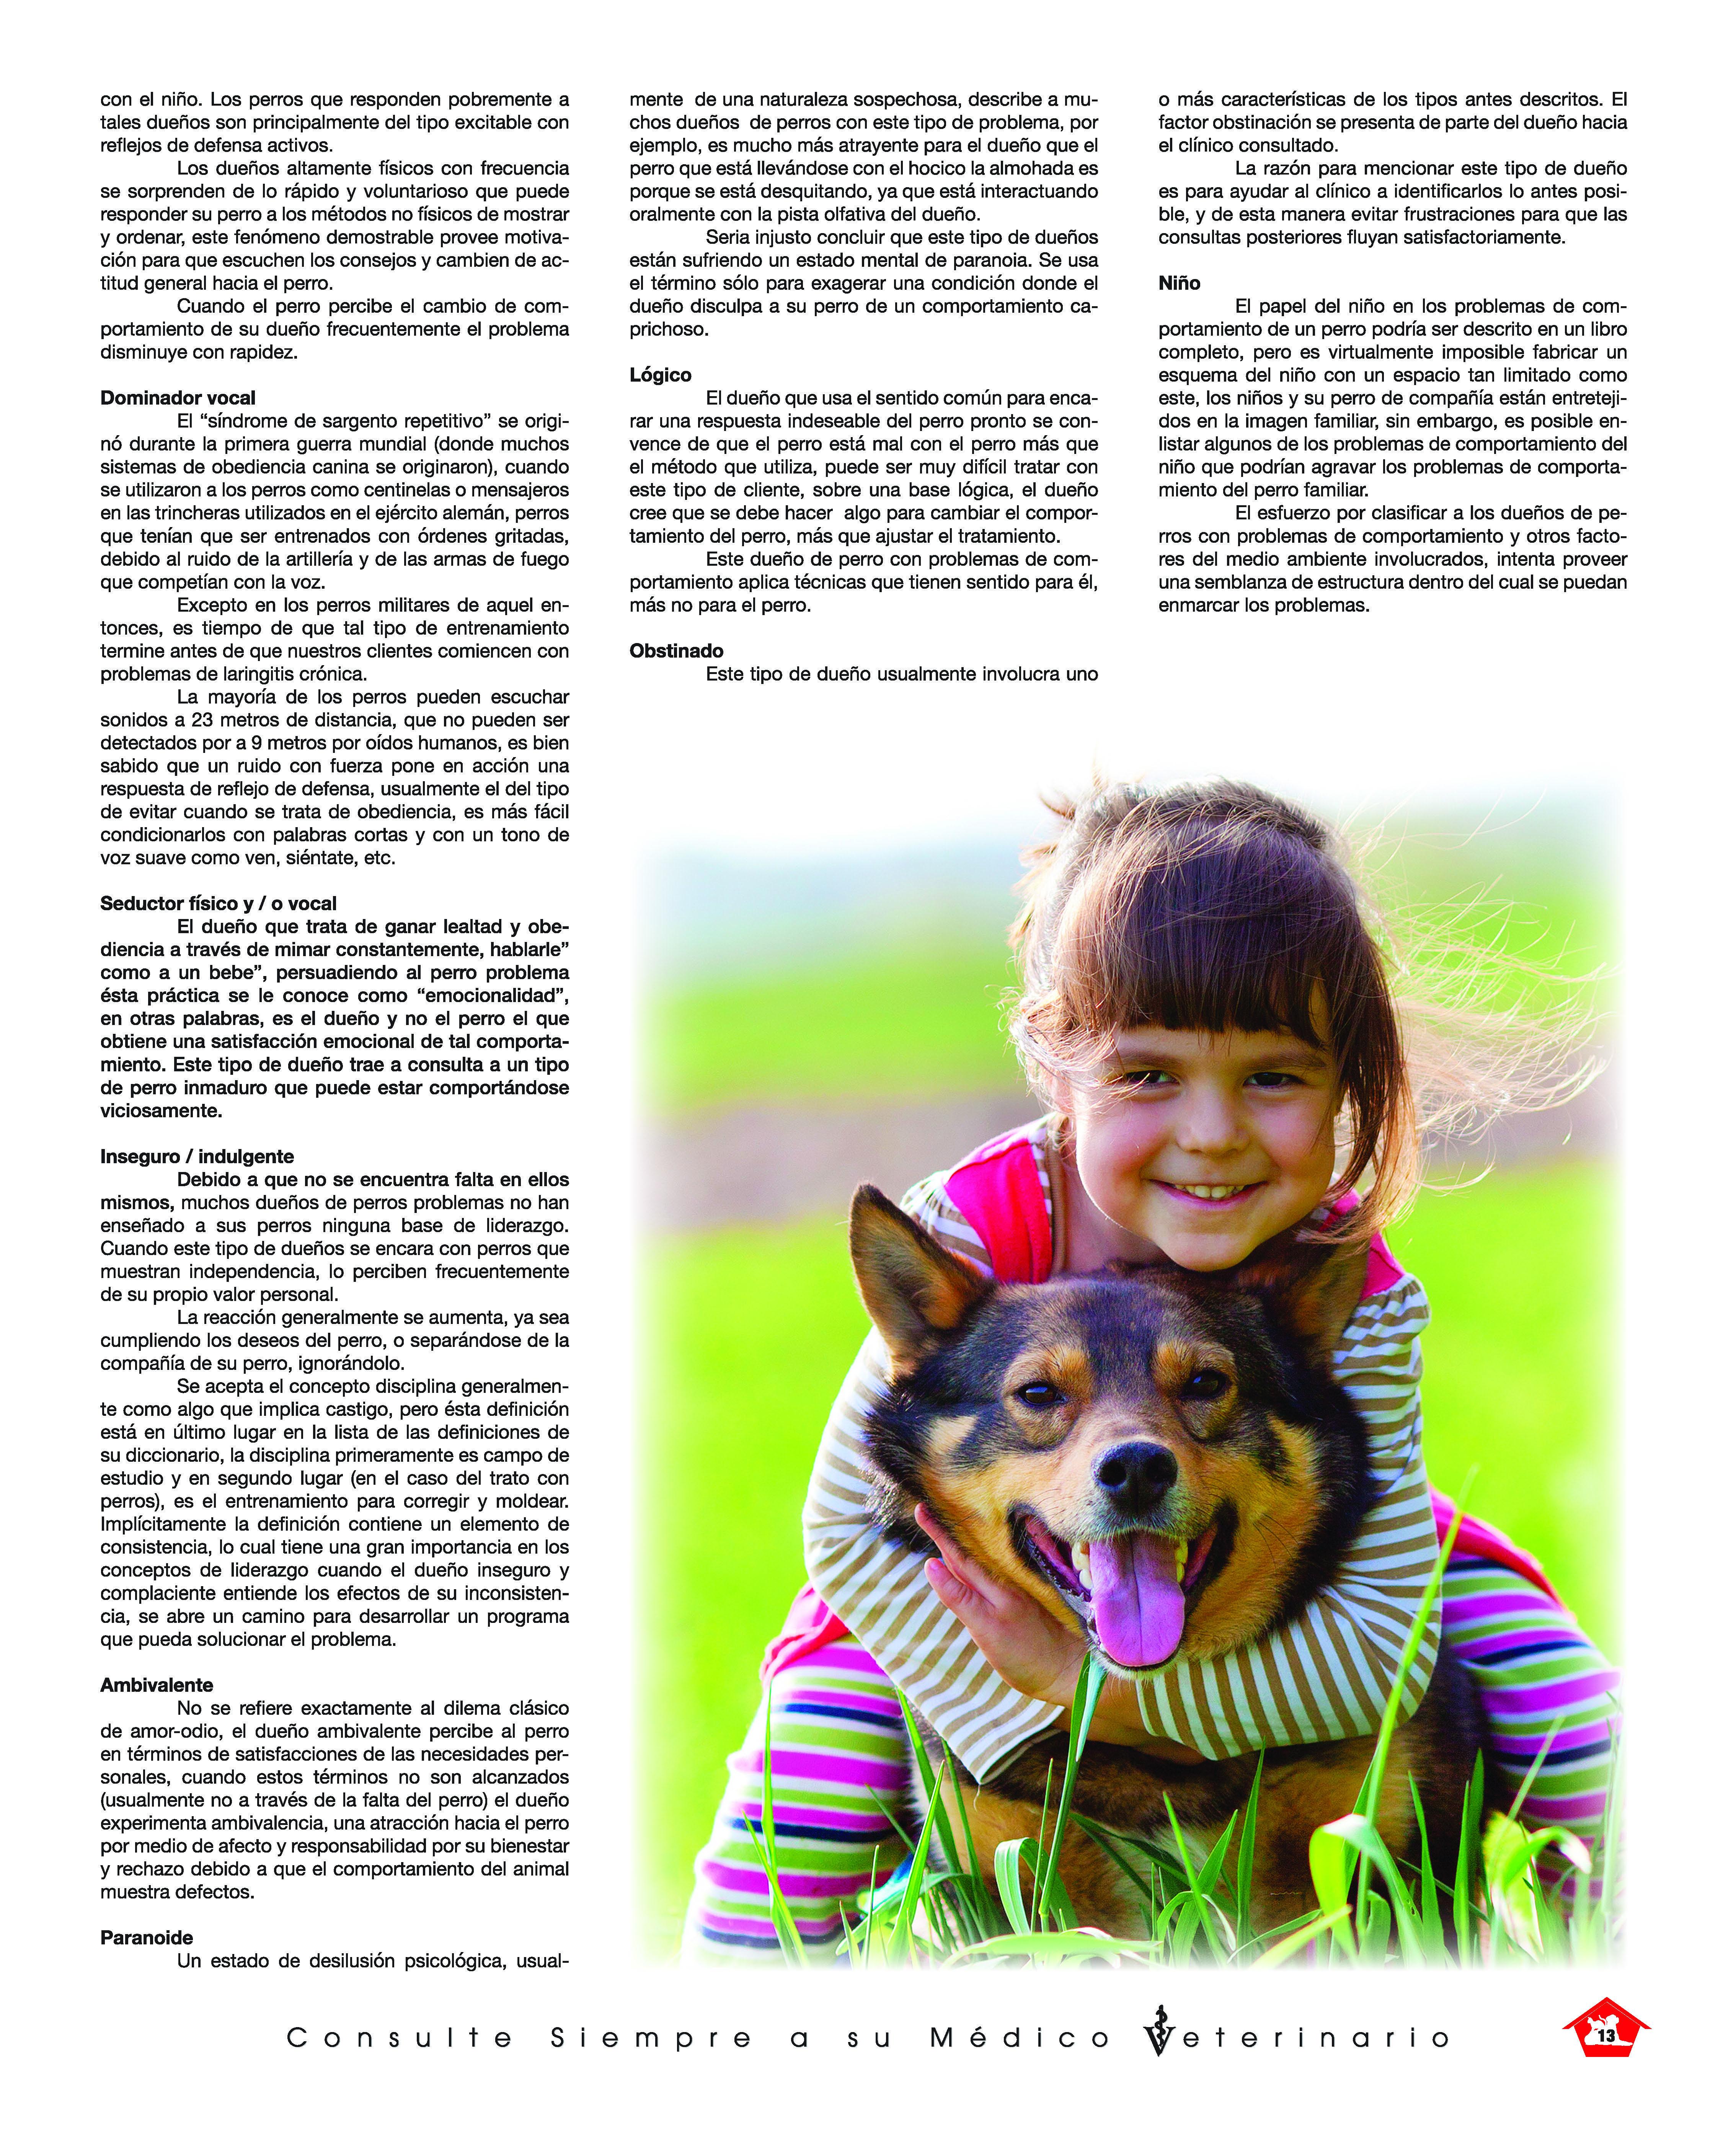 http://www.notican.com/wp-content/uploads/2019/10/Notican-Setiembre-2019-copy_Página_13.jpg